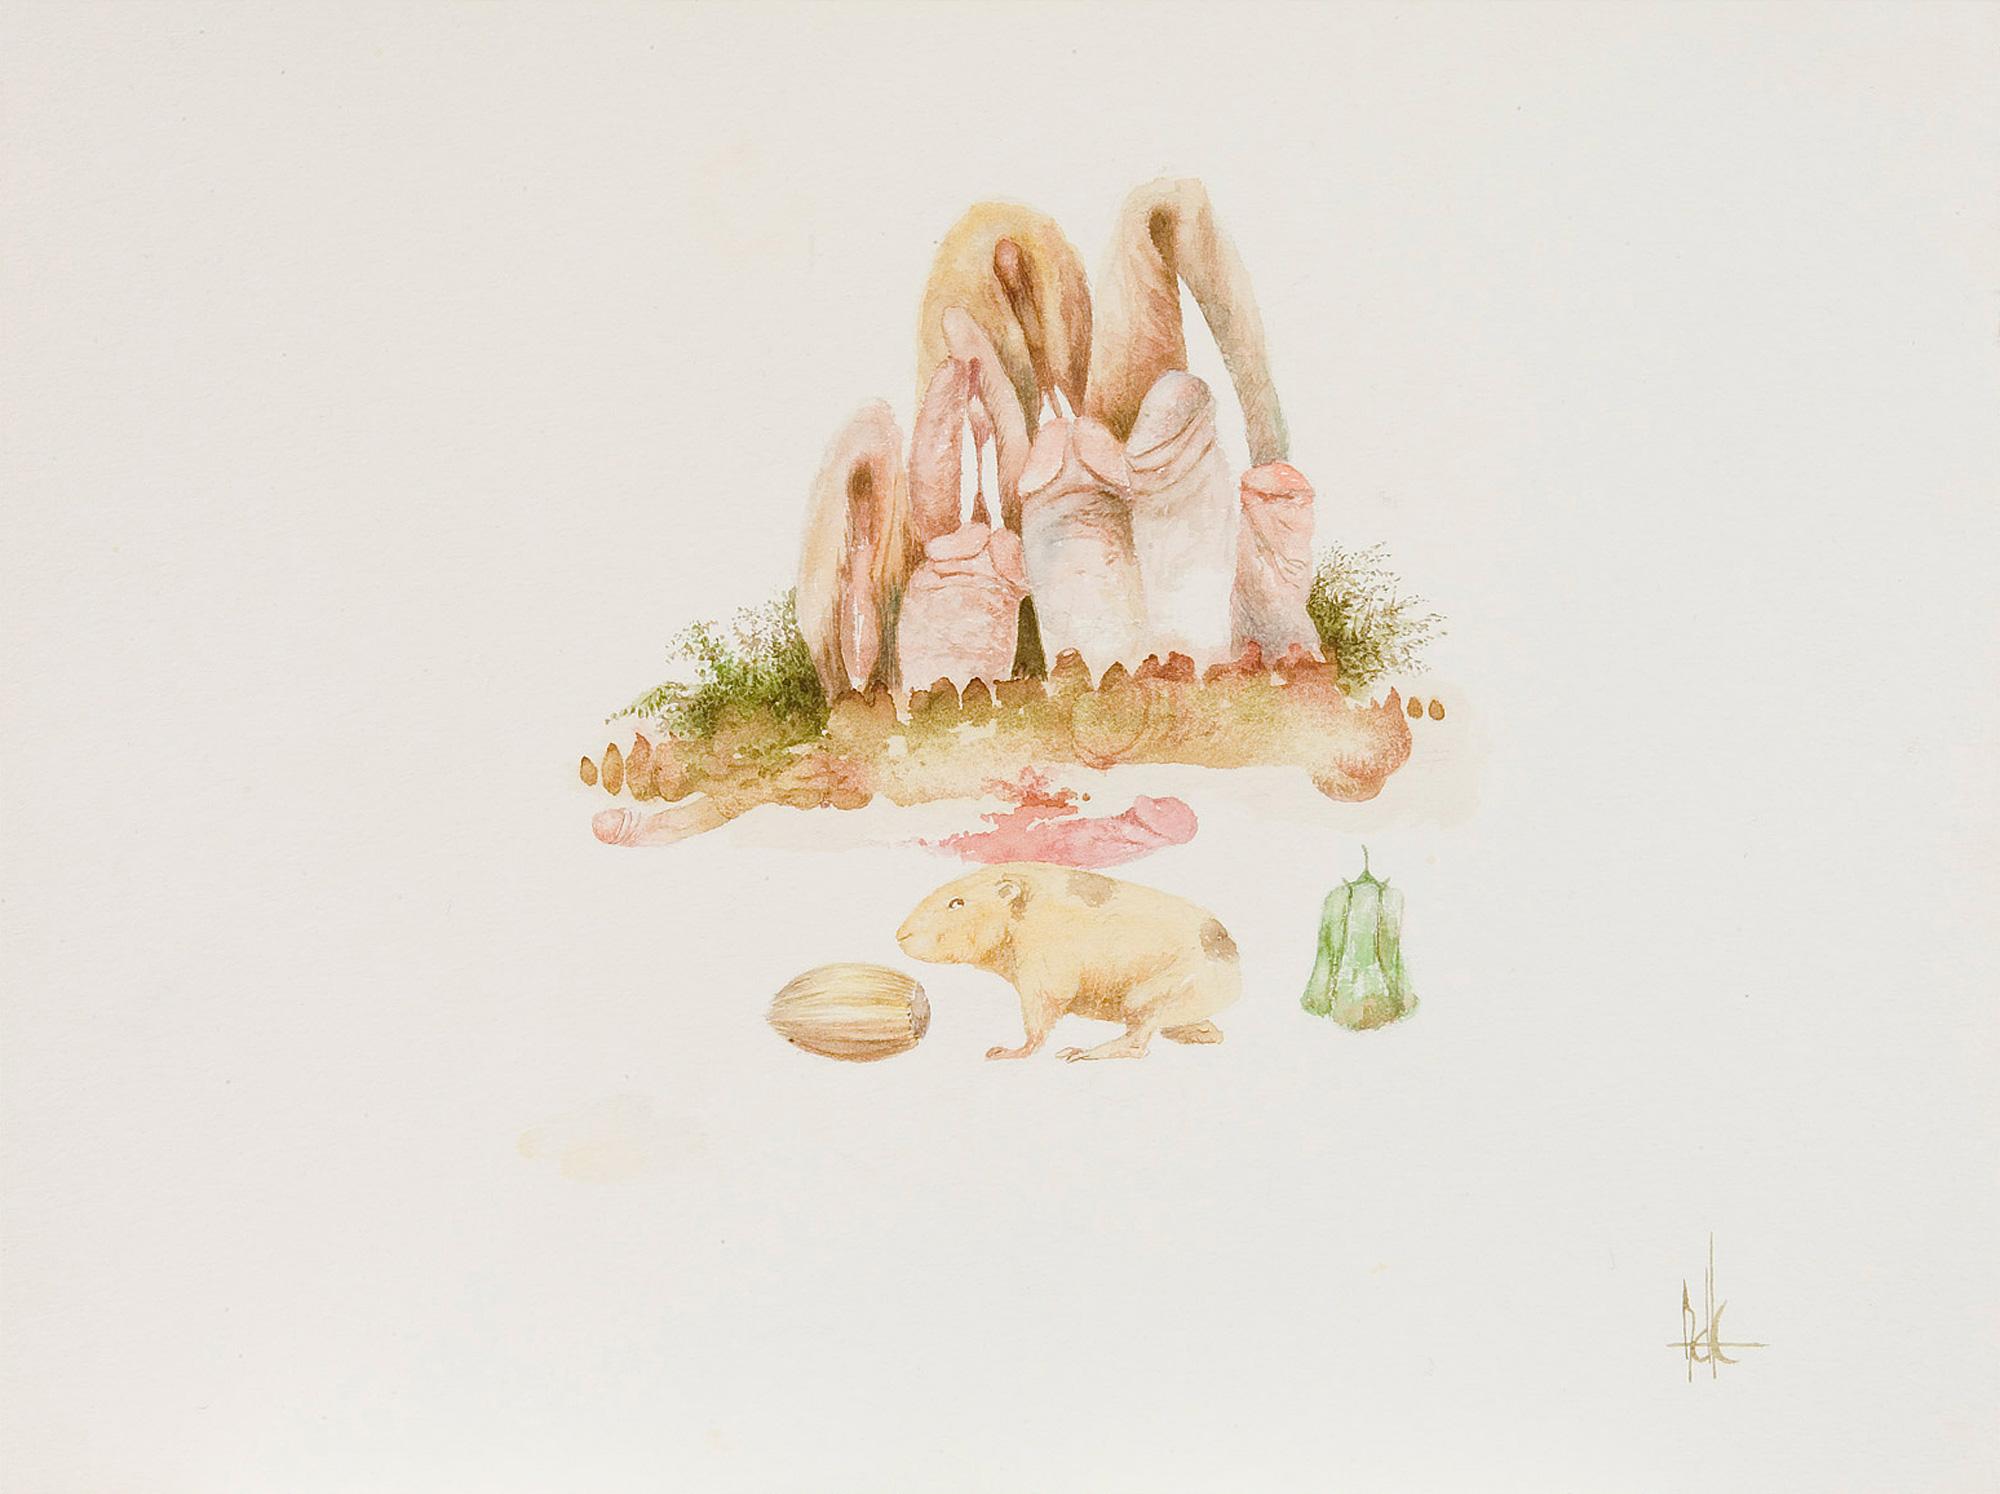 Melle schilder | zonder titel, aquarelverf op papier